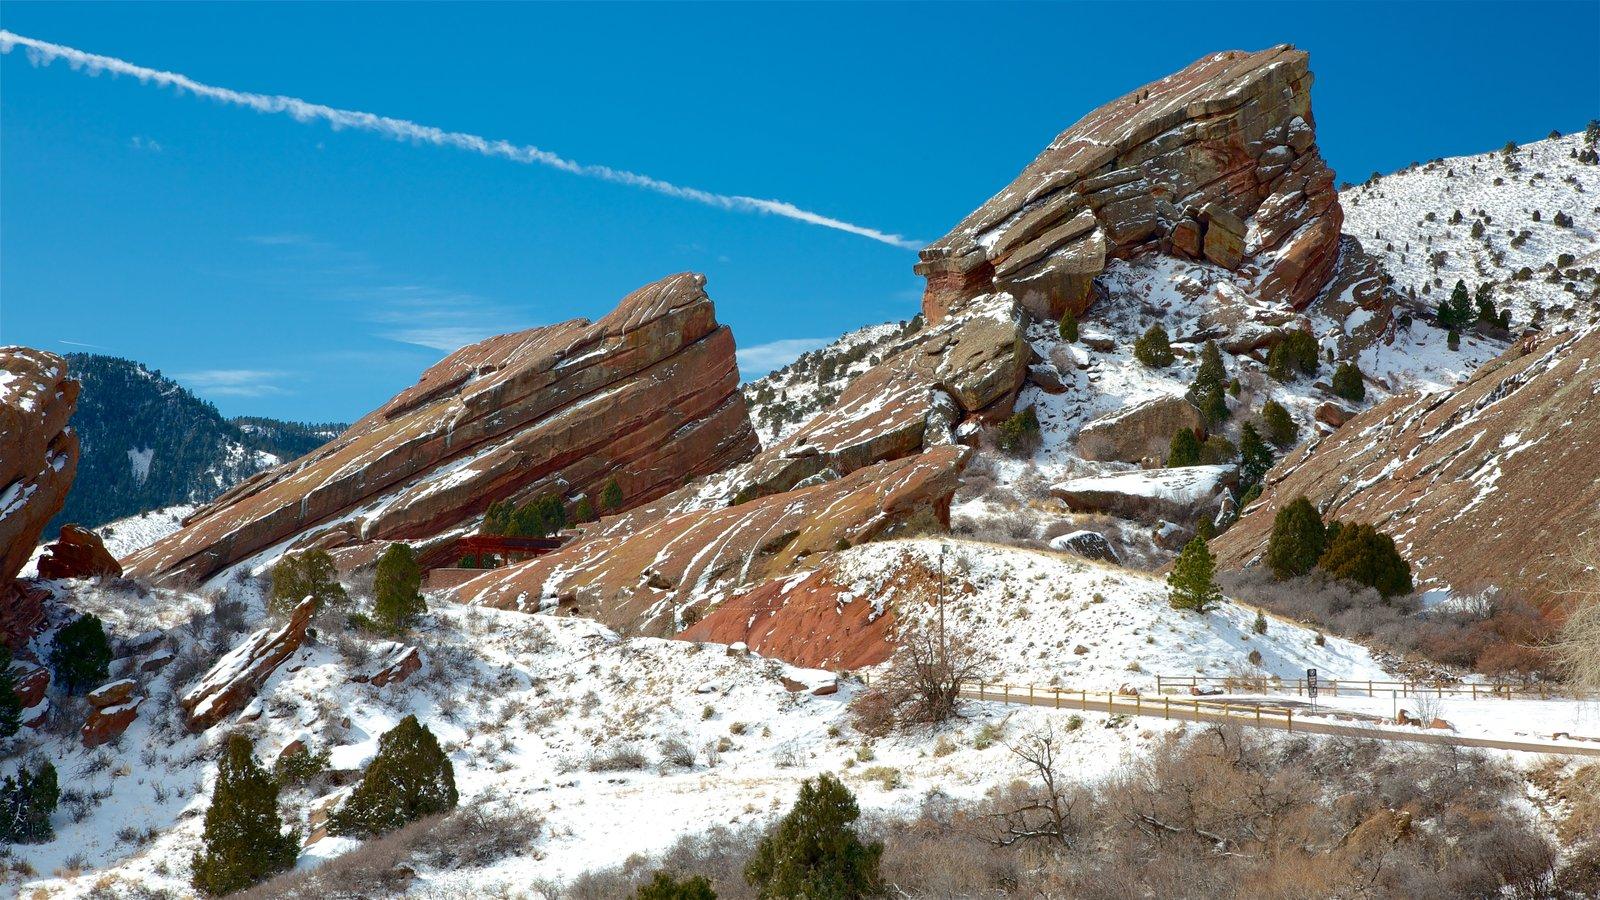 Red Rocks Amphitheater mostrando montanhas